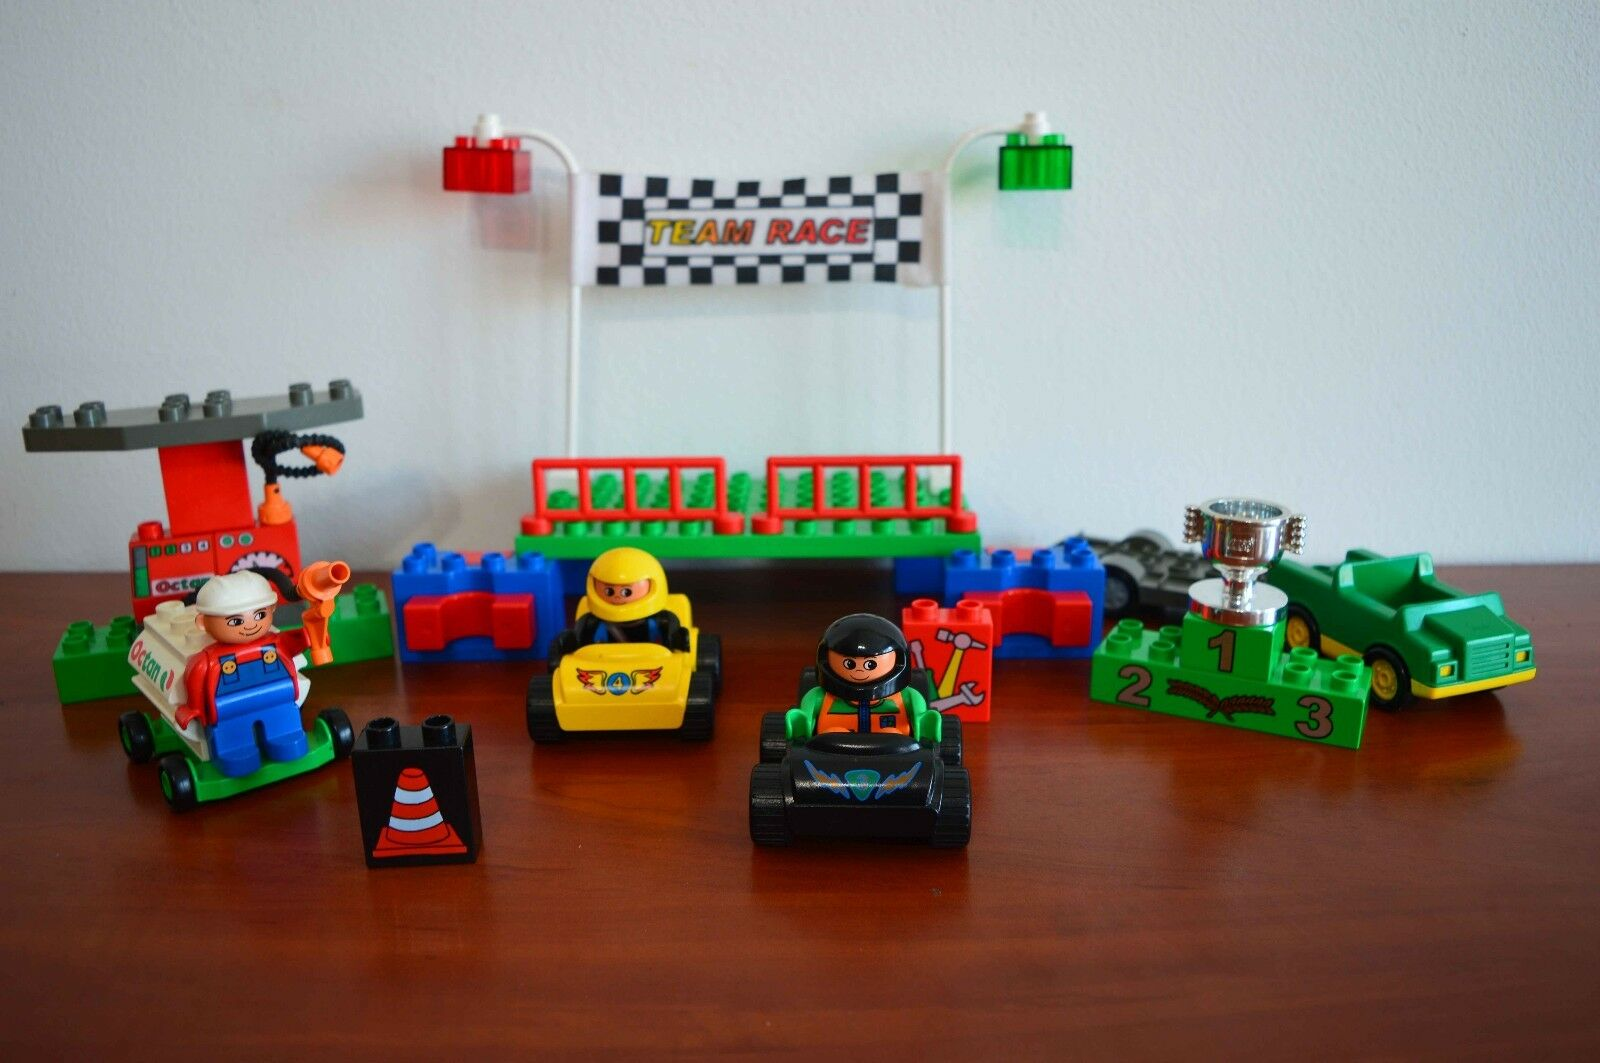 Lego Lego Lego Duplo Explore Logic Town Race Set like 3614-1 Racing - free shipping d25fb7